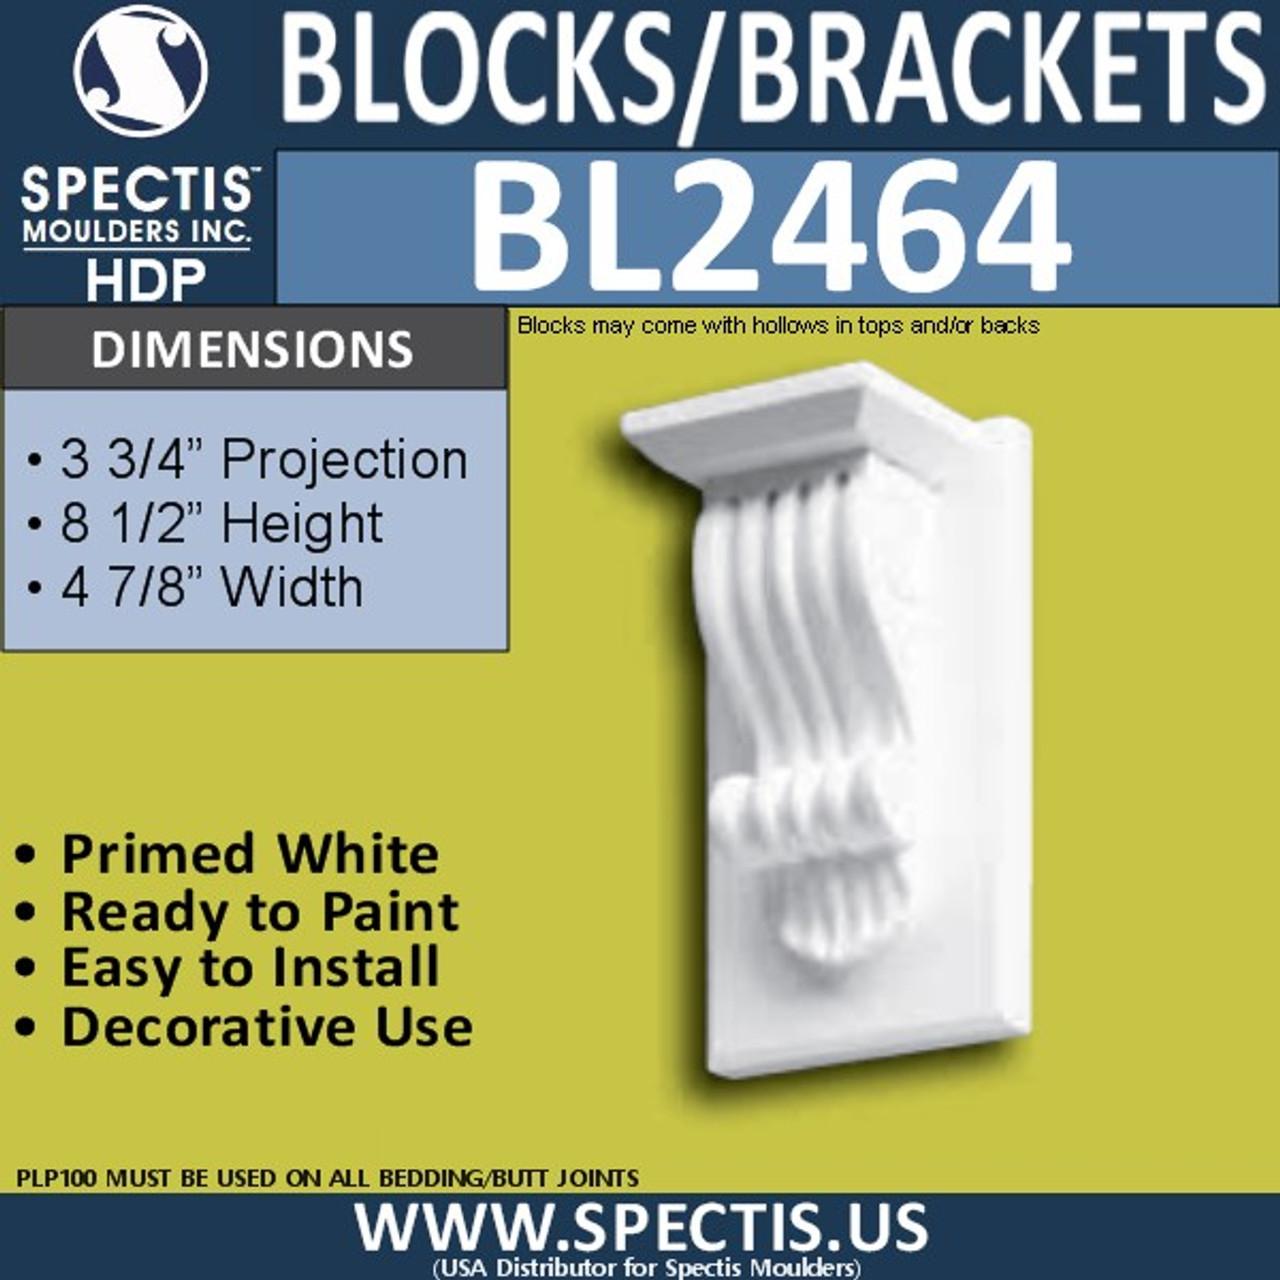 "BL2464 Eave Block or Bracket 5""W x 8.5""H x 3.75"" P"